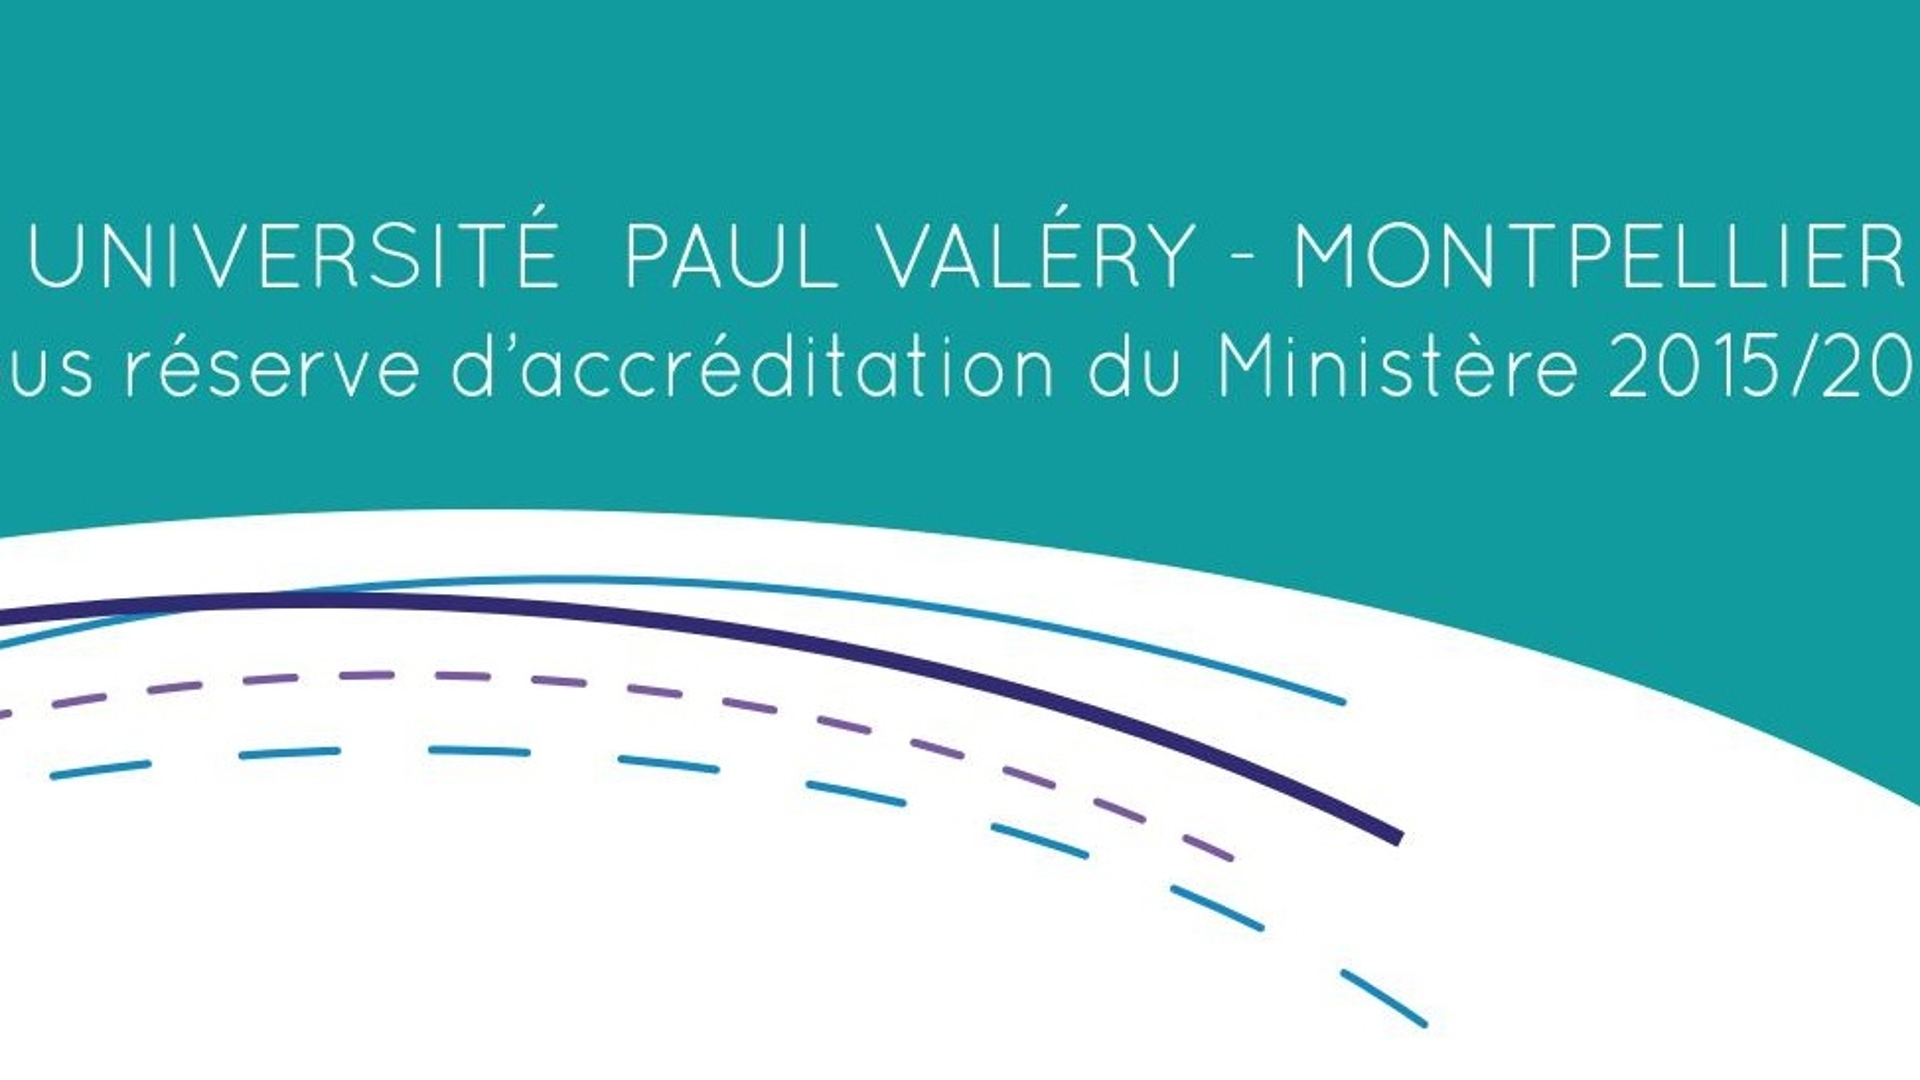 Calendrier Paul Valery.Formation A Distance Licence En Arts Lettres Langues